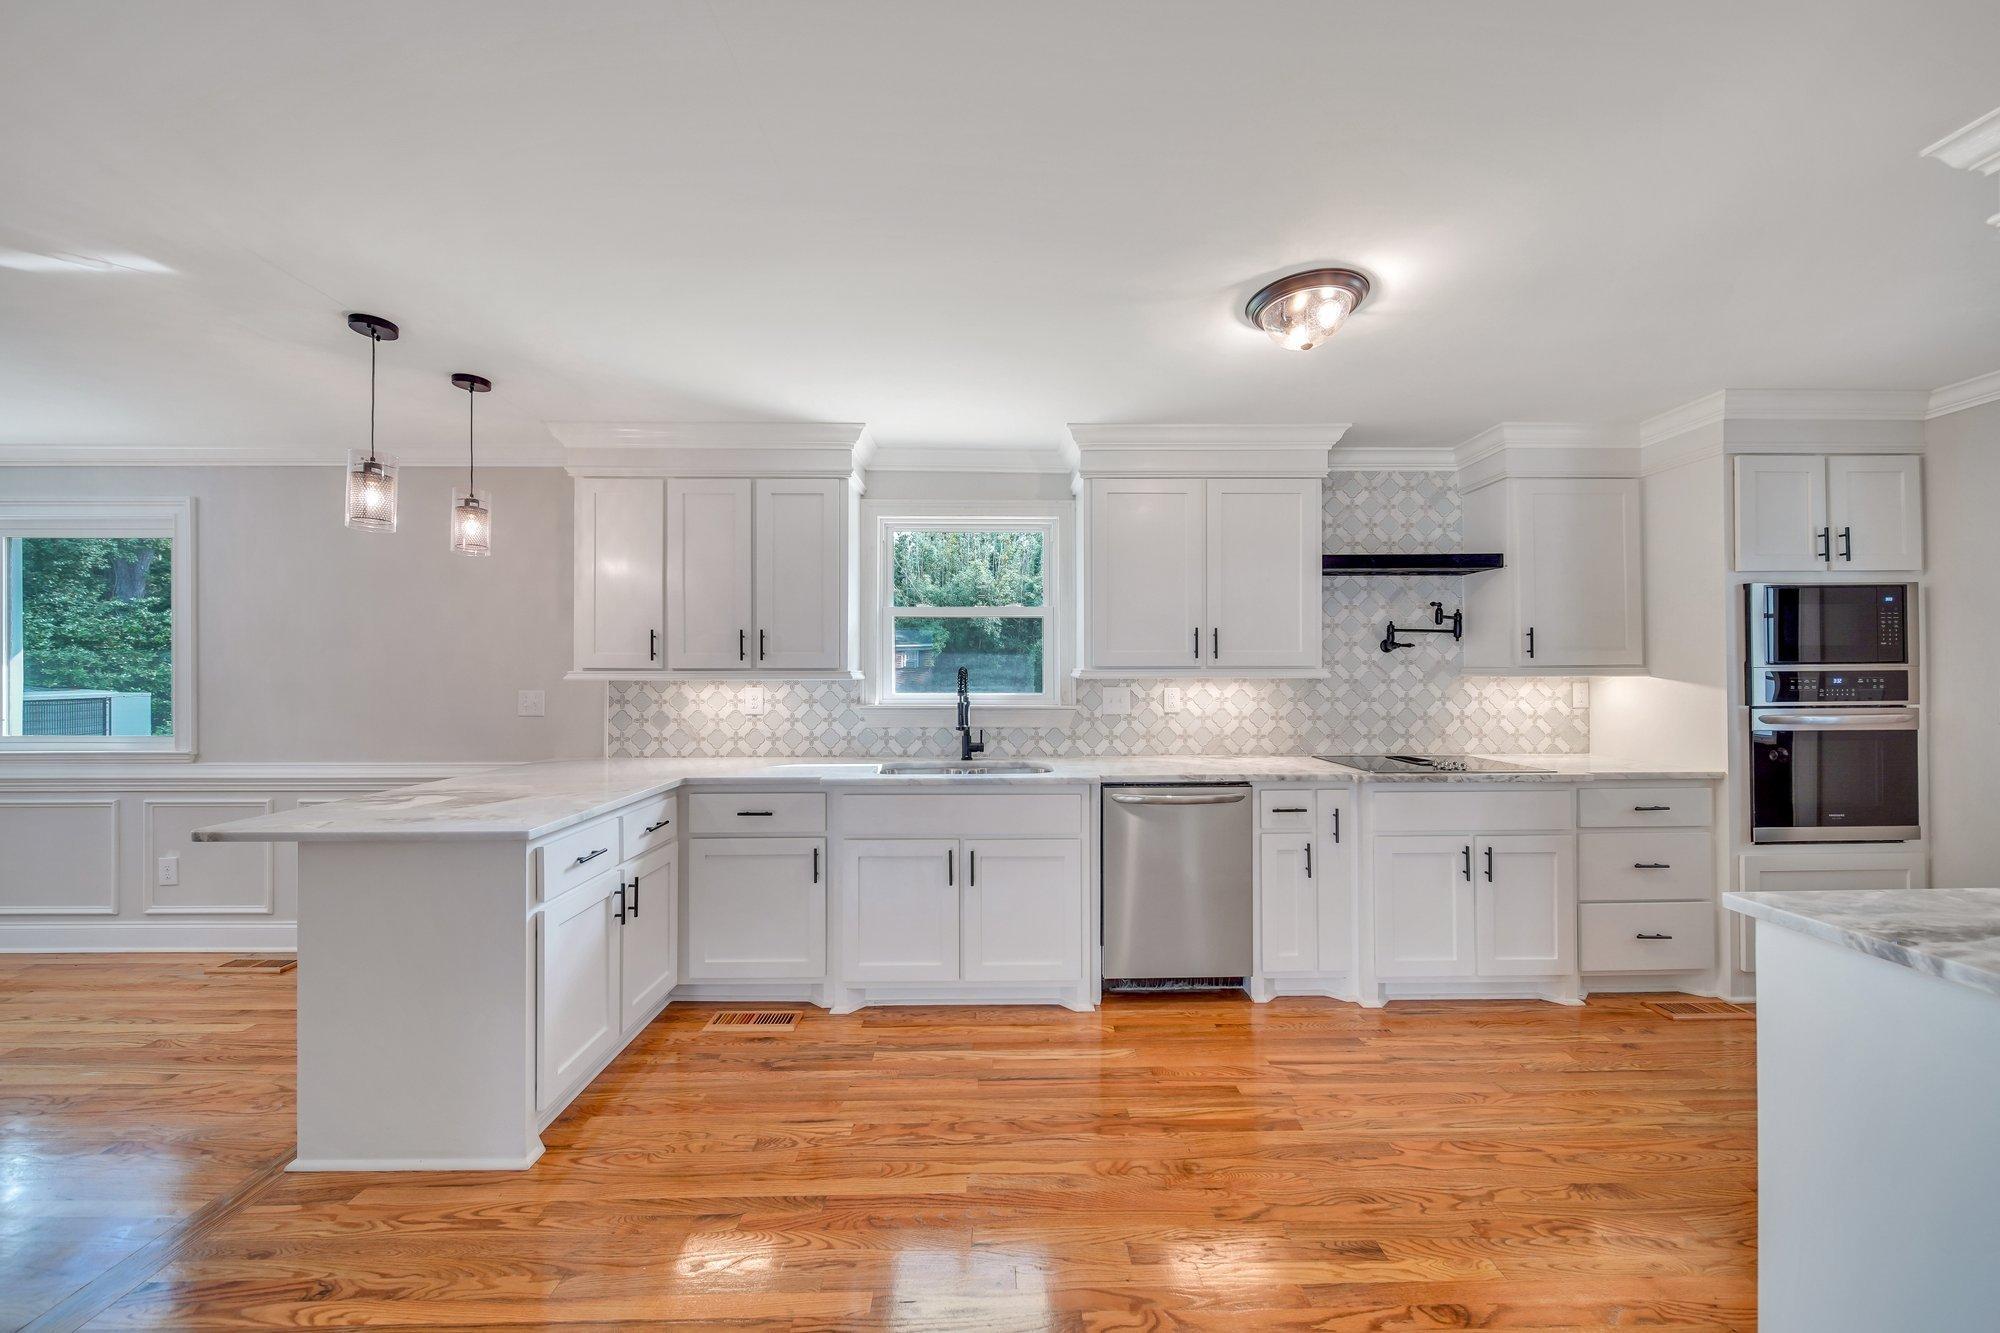 Country Club II Homes For Sale - 1477 Burningtree, Charleston, SC - 11